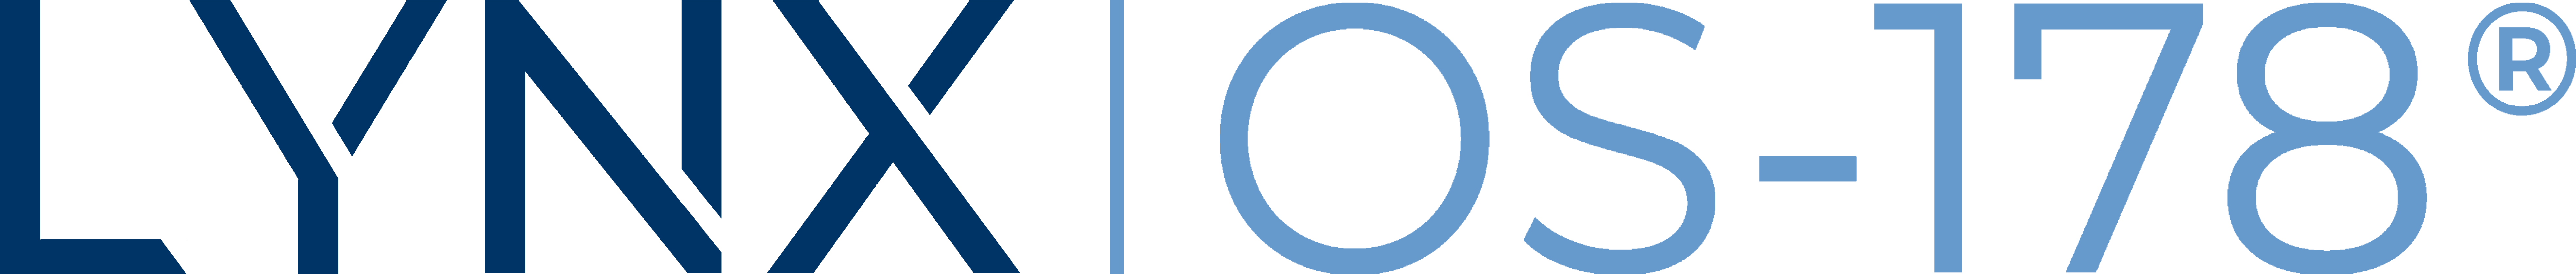 LYNX-OS-178_logo